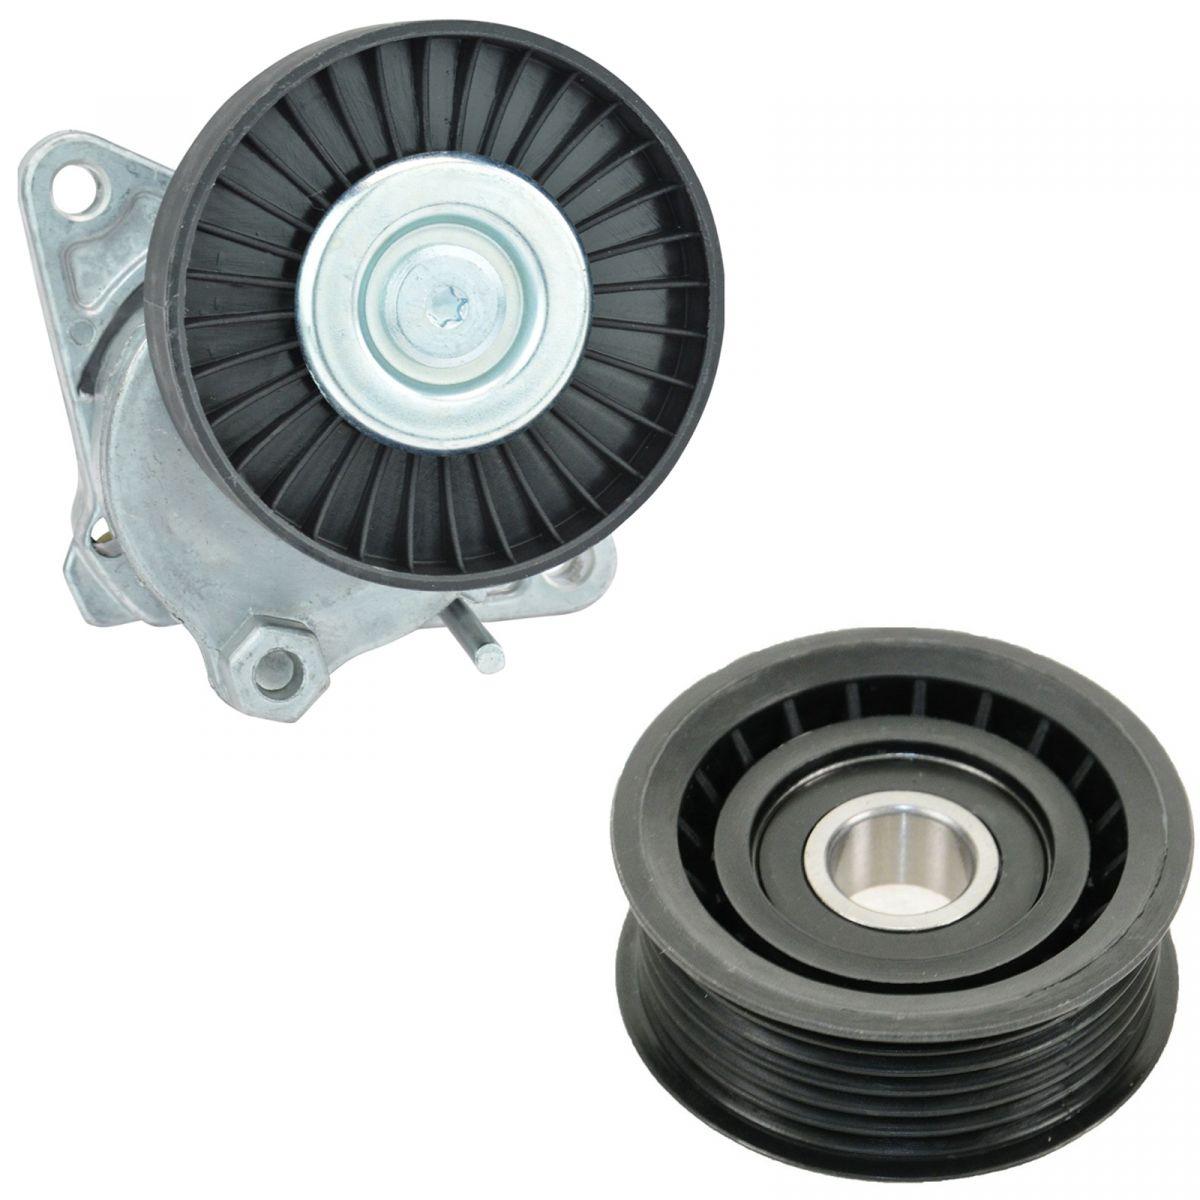 For c240 c320 e320 e500 ML320 ML500 SL500 Serpentine Drive Belt Mercedes Benz